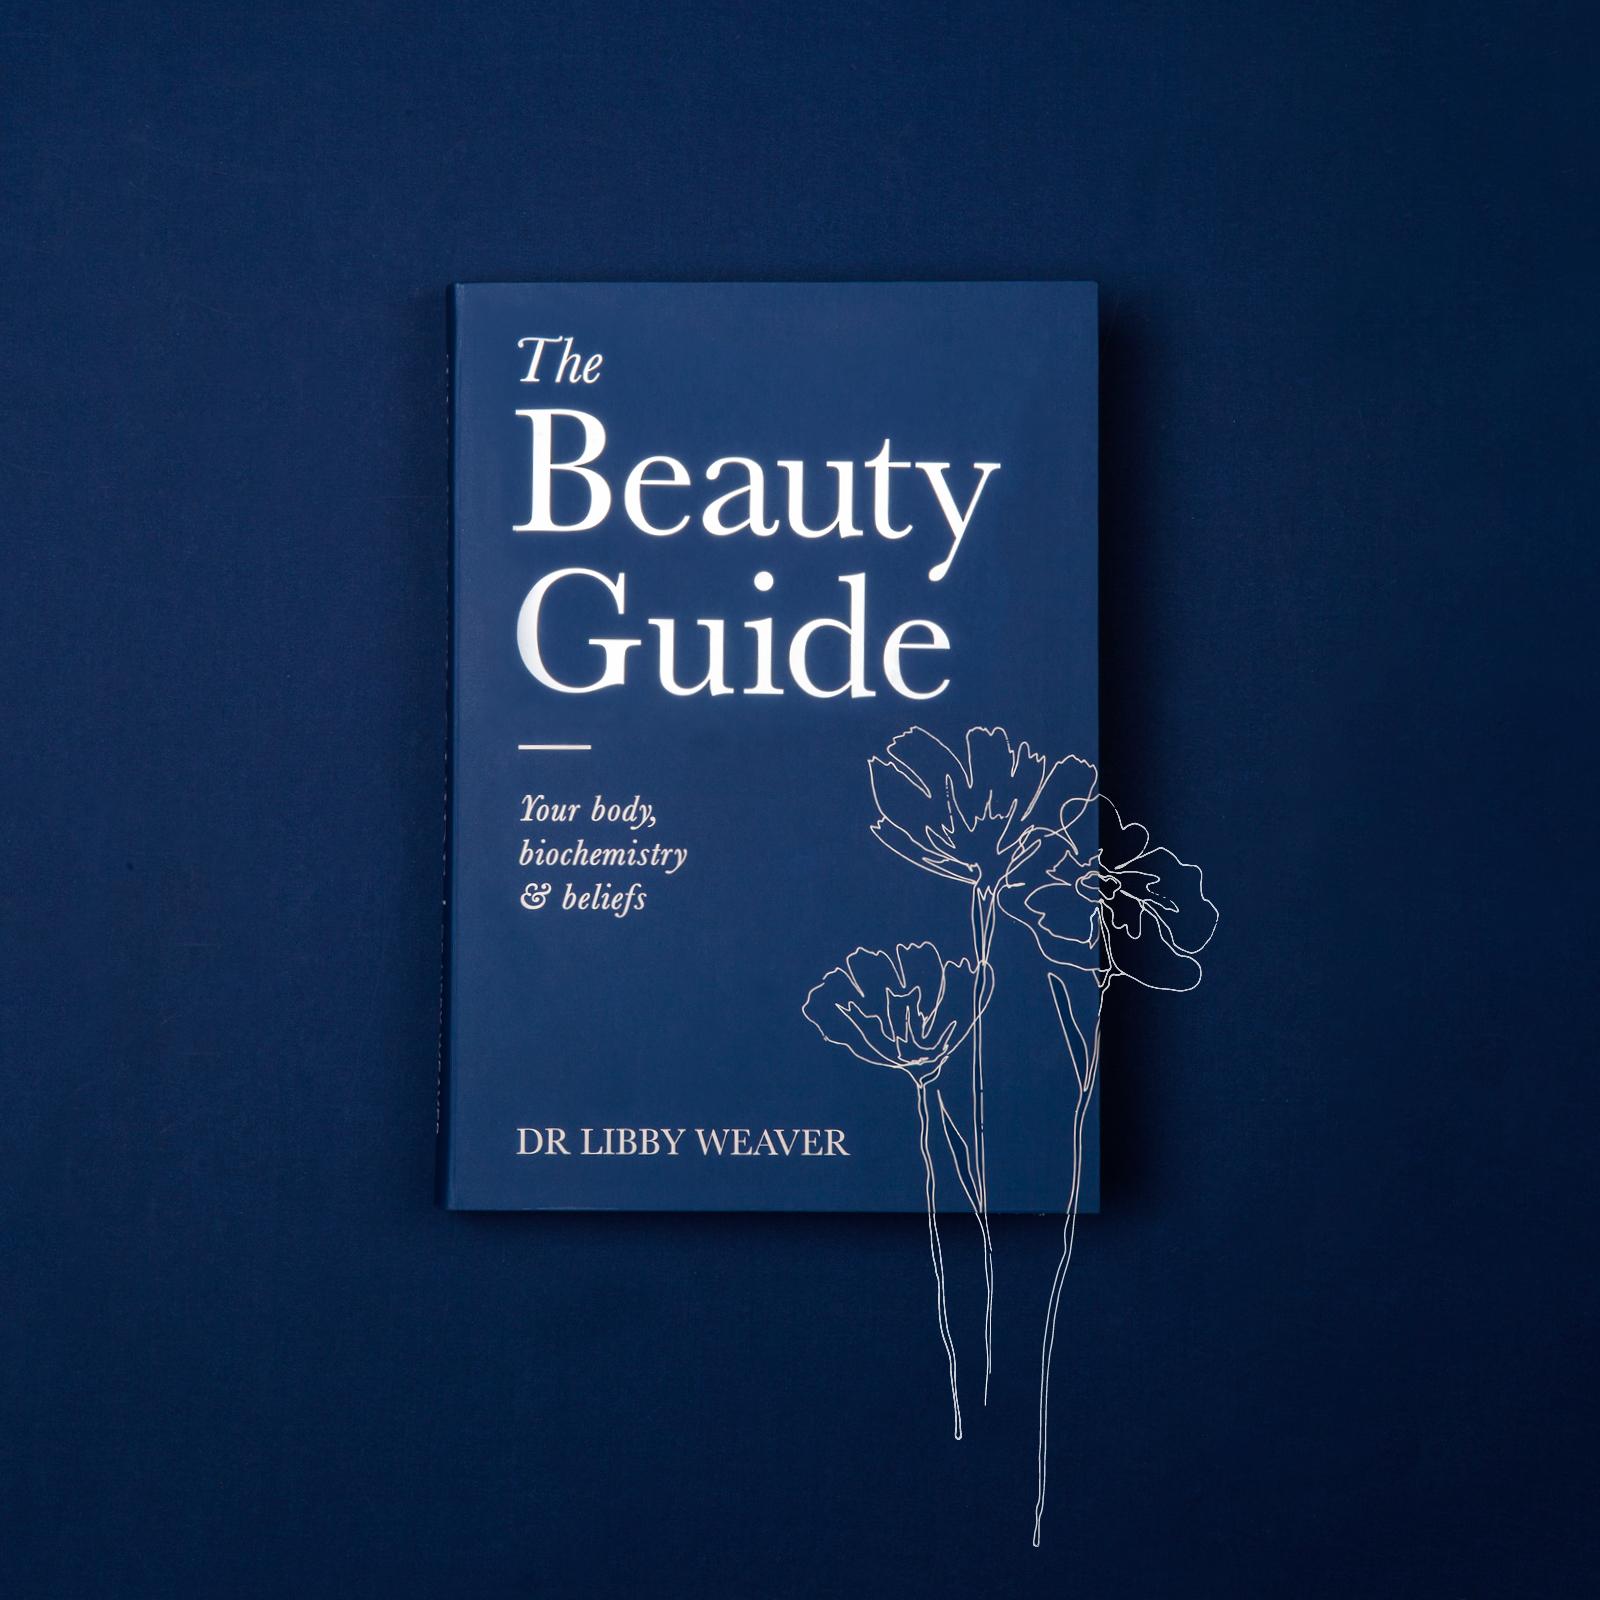 The Beauty Guide - Publication design & illustration